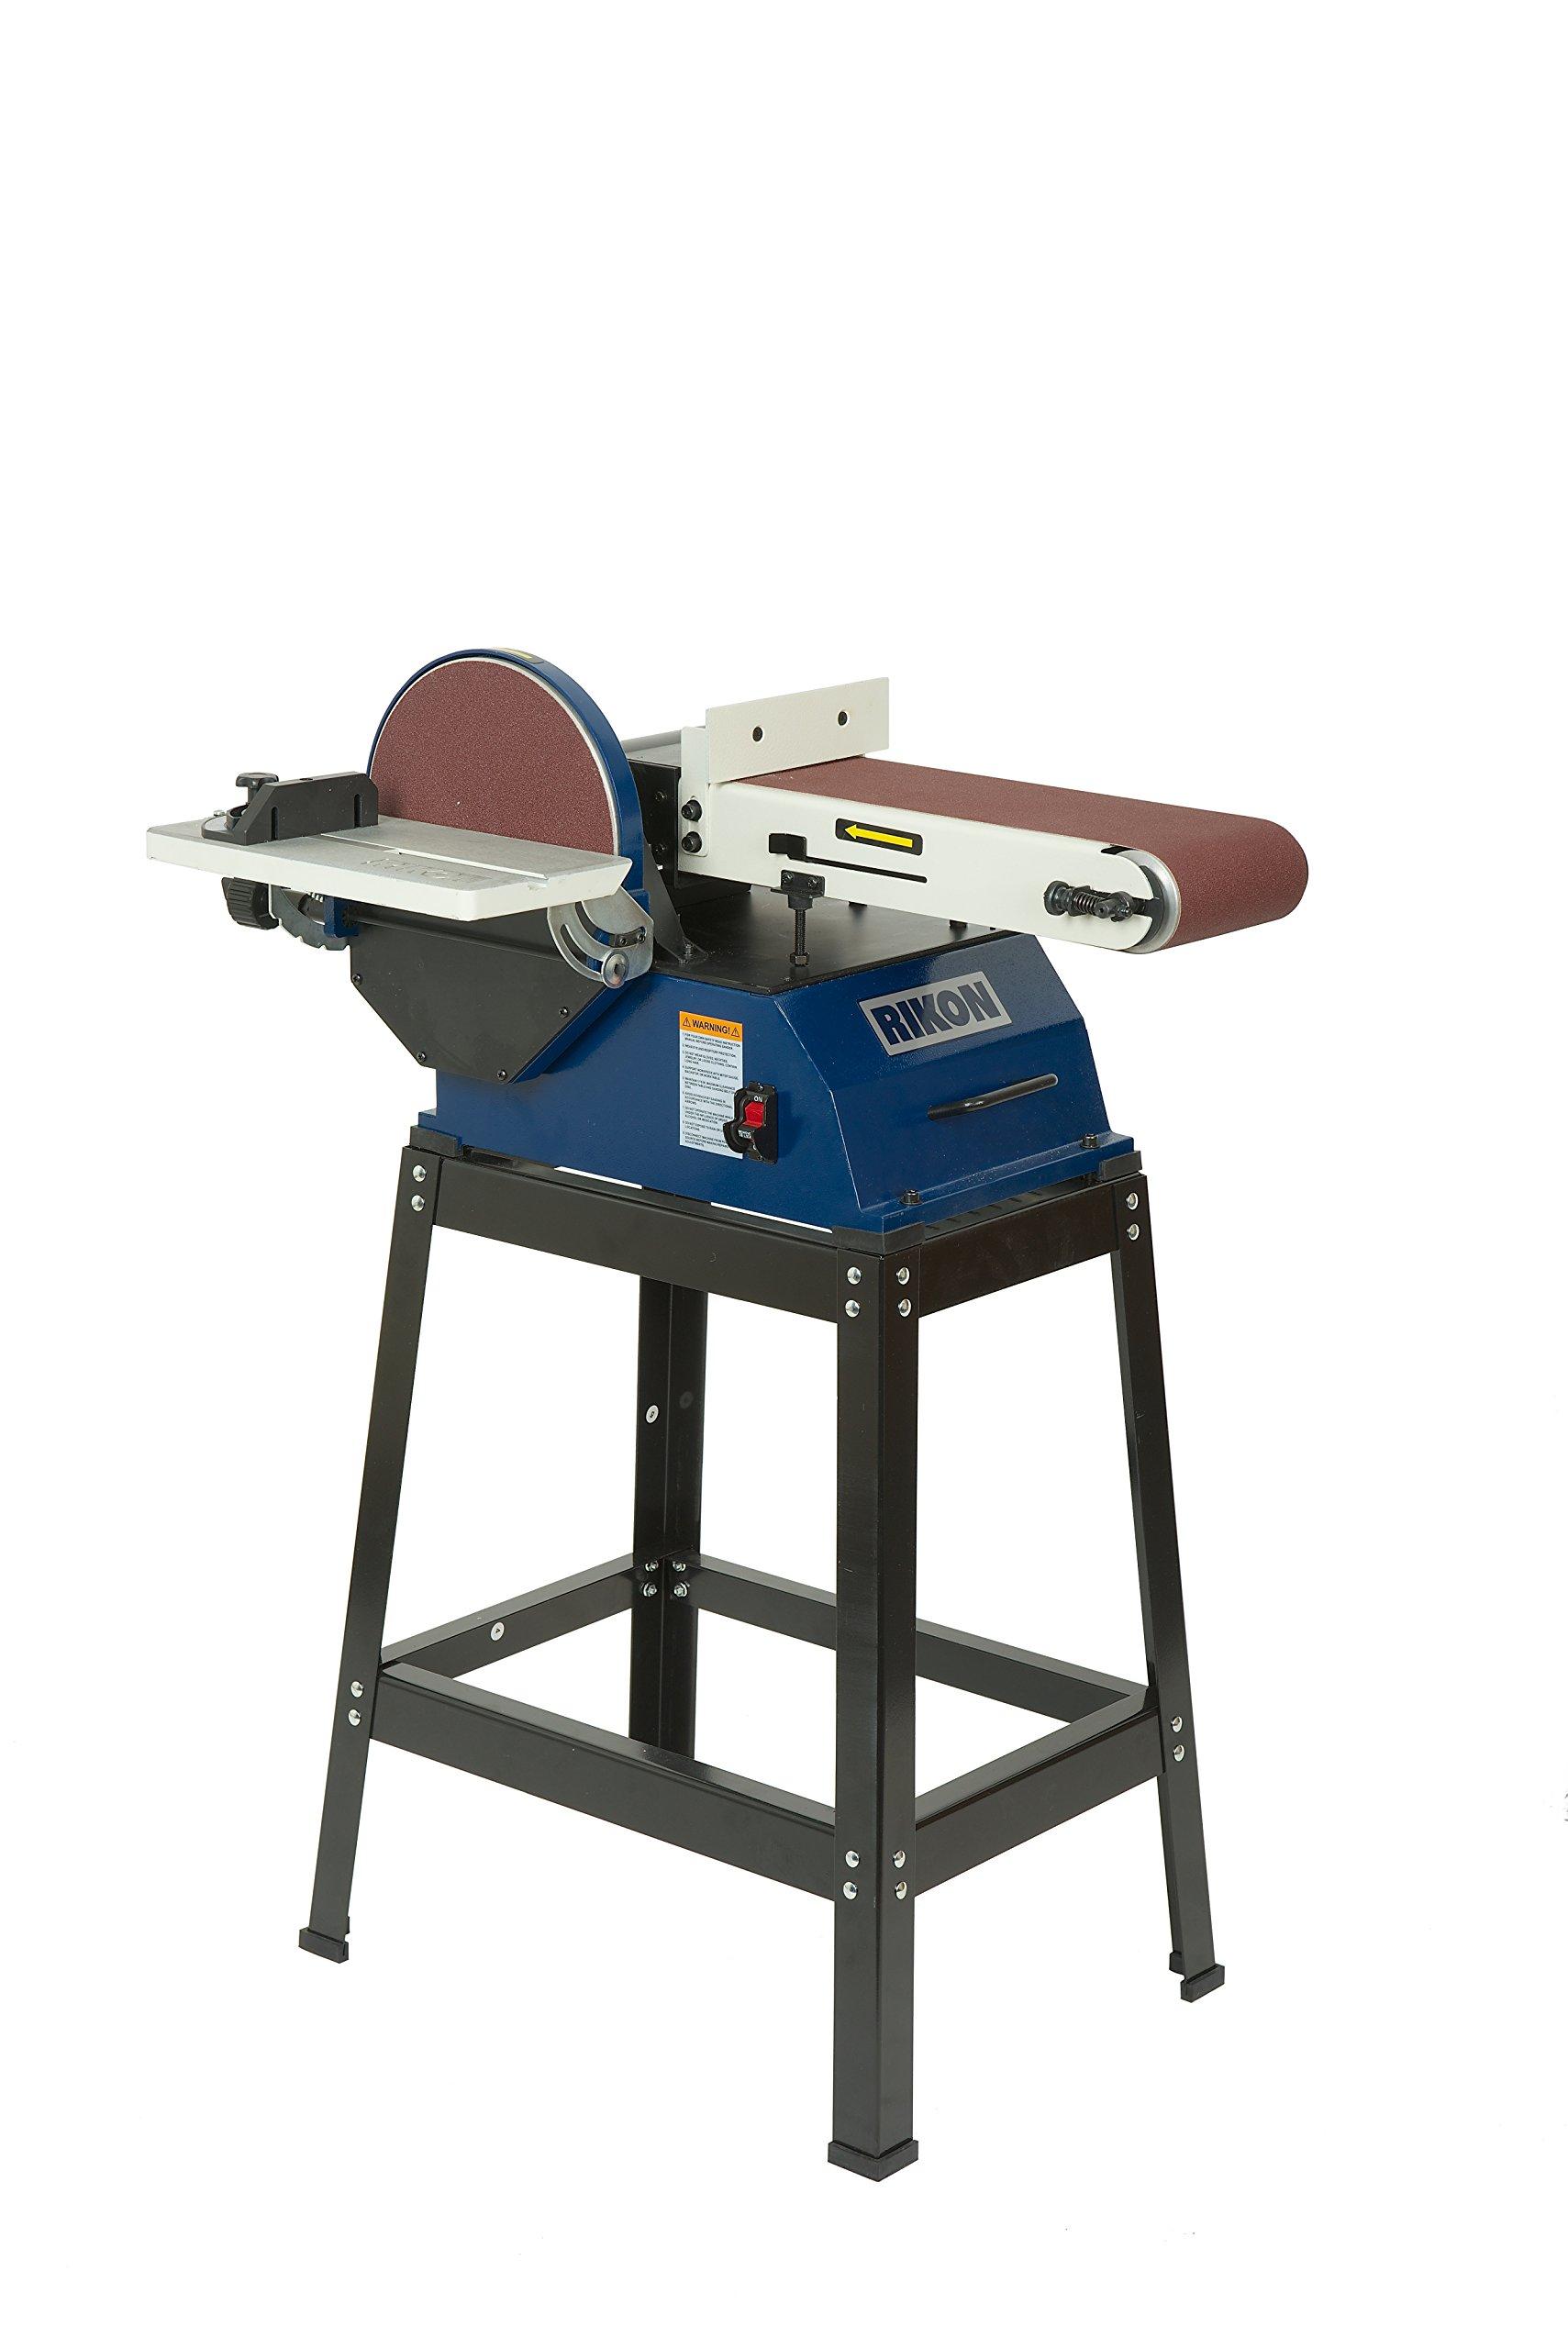 RIKON Power Tools 50 122 Sander